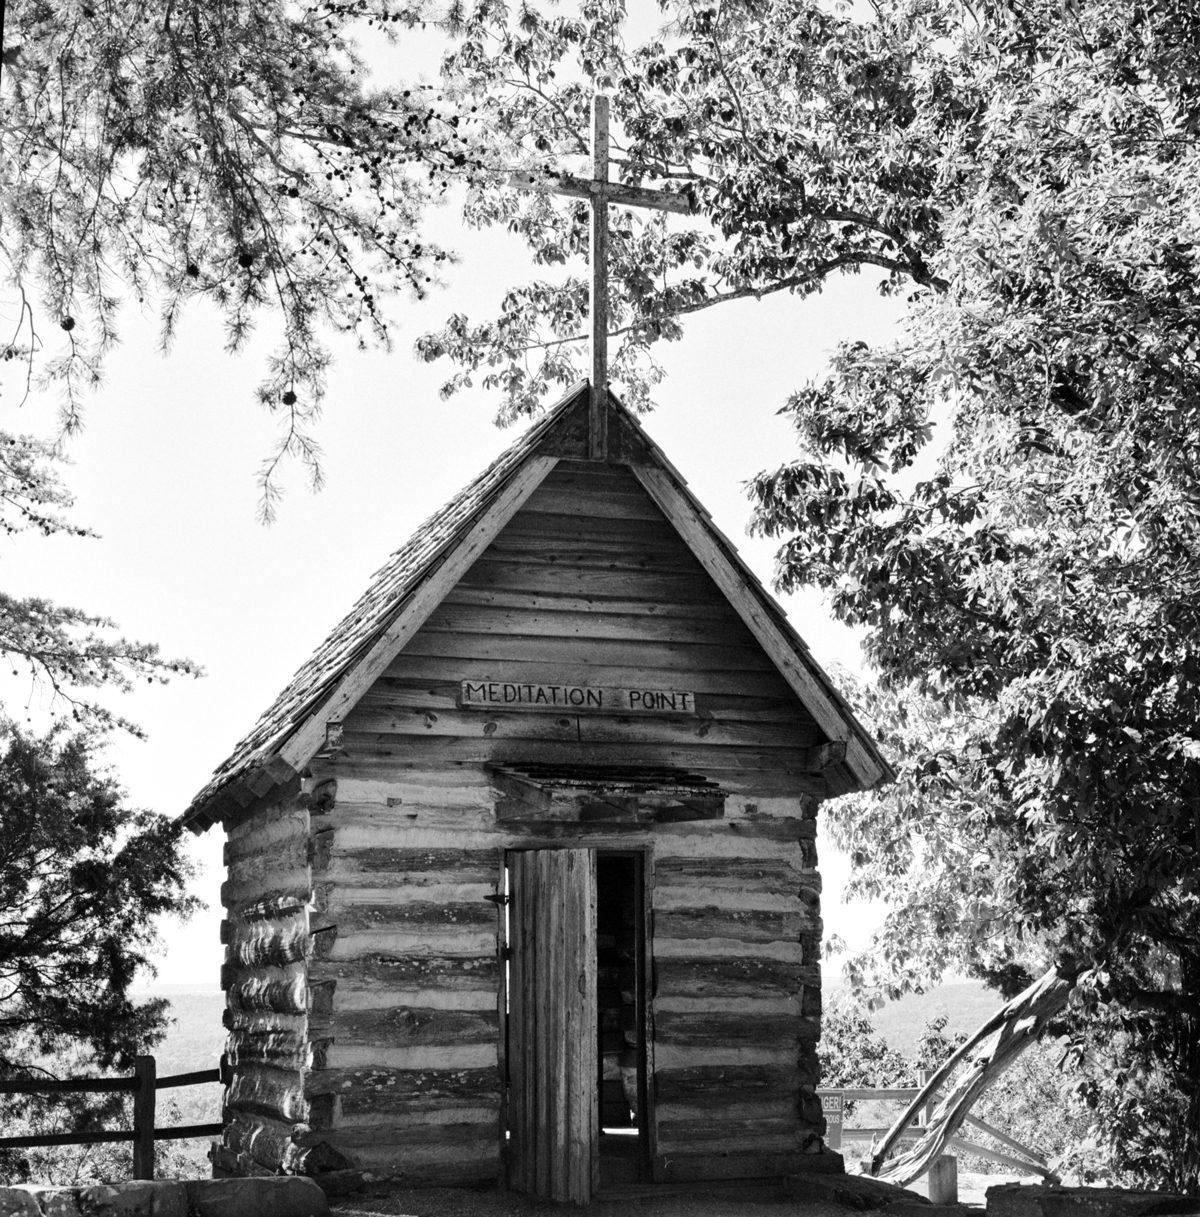 @bsanfordjr · 16h Replying to @ILFORDPhoto Meditation Point, Palisades Park, Blount County Alabama #worshipfilm #ilfordphoto #fridayfavourites #ilfordhp5